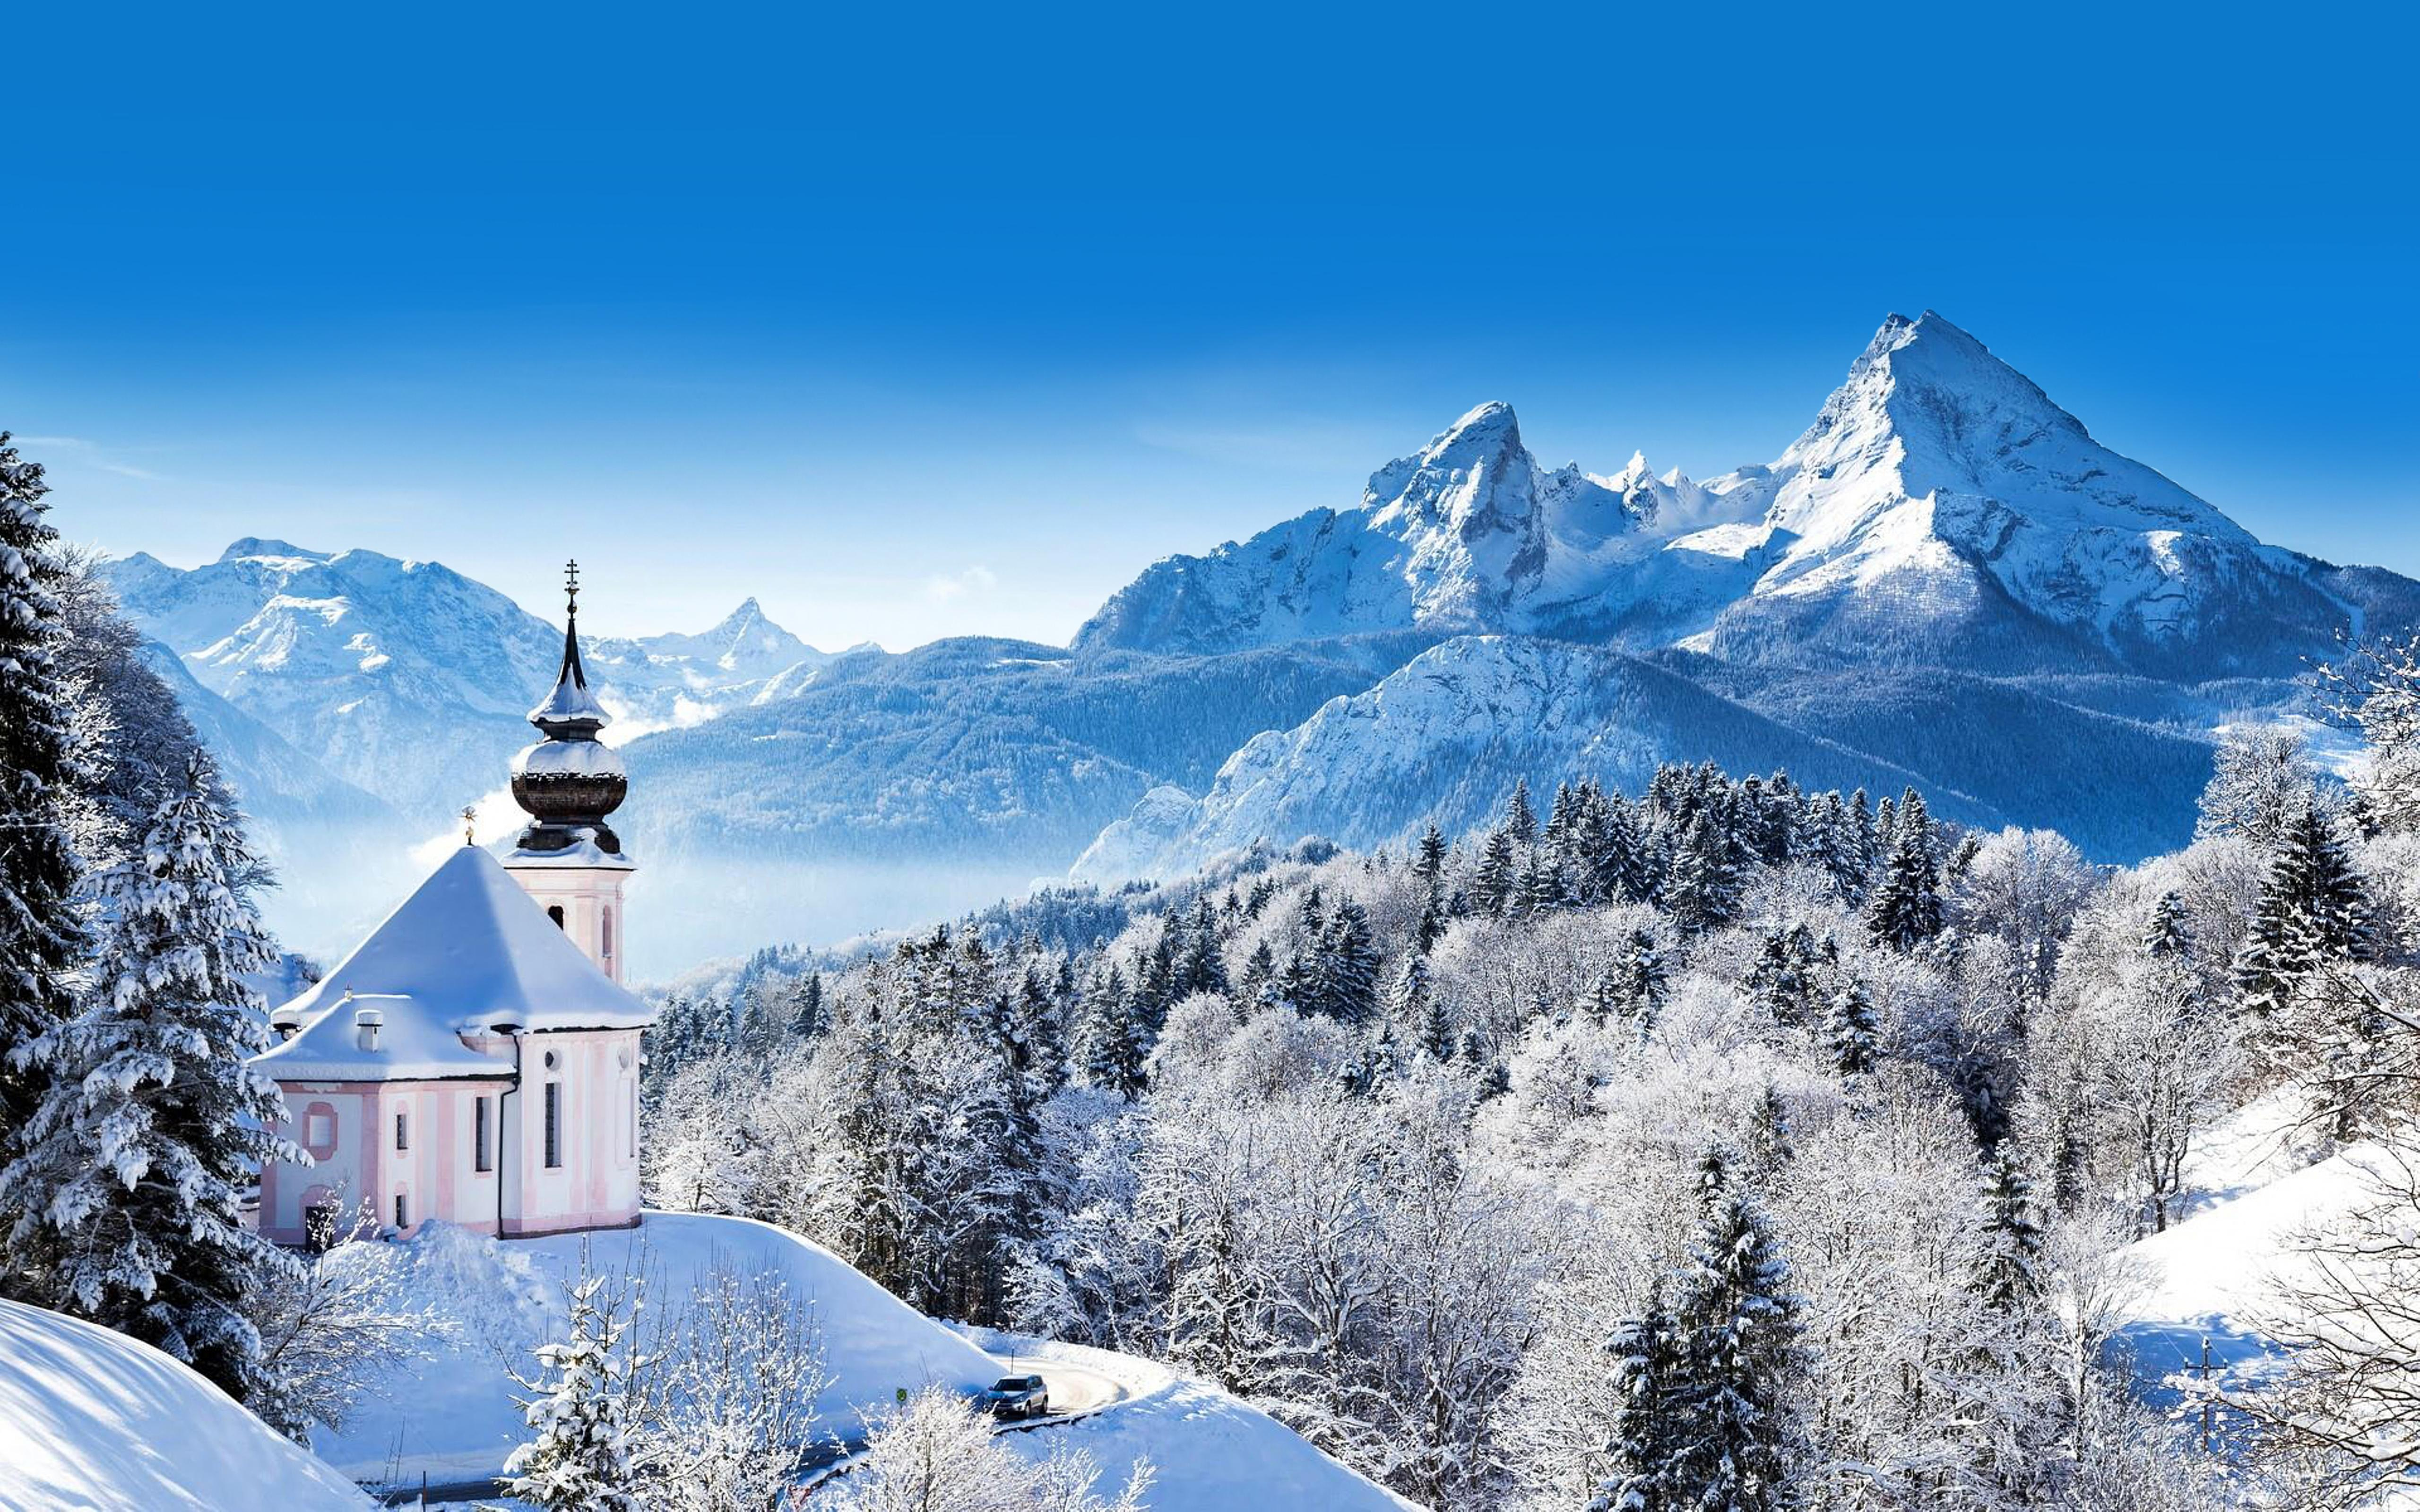 Wonderful Winter Mountain Wallpaper Berchtesgaden Germany